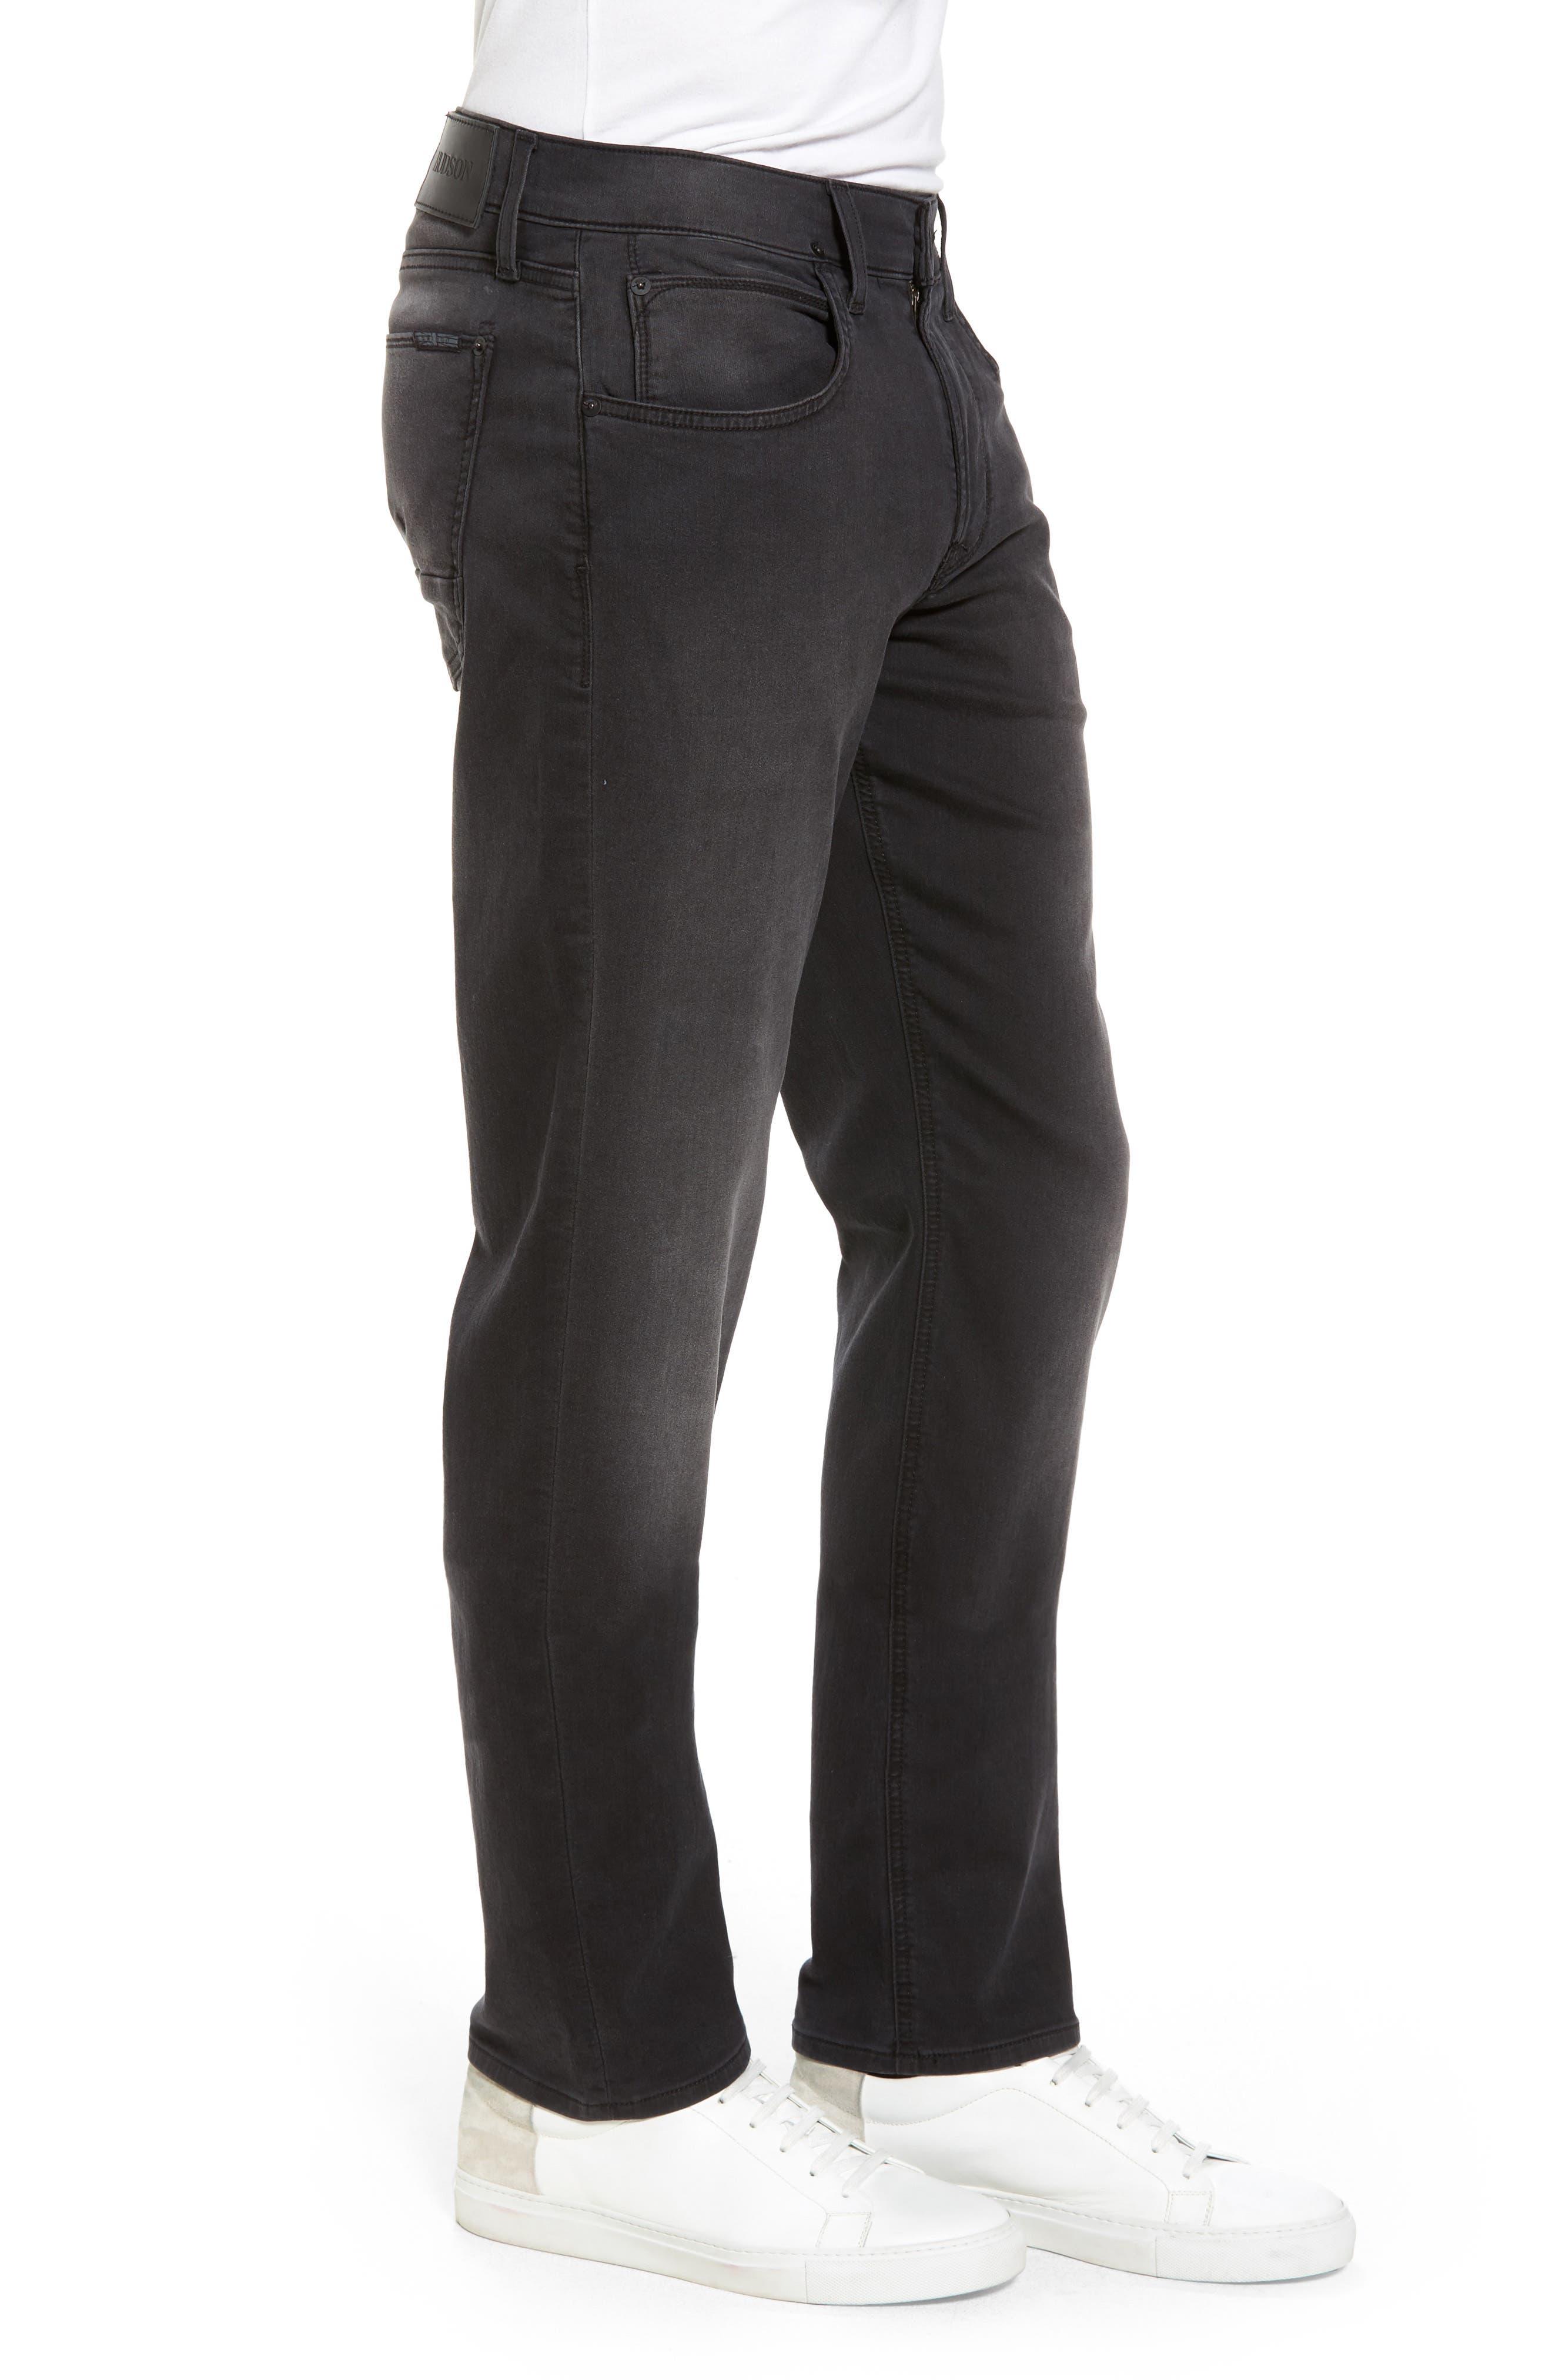 Blake Slim Fit Jeans,                             Alternate thumbnail 3, color,                             001